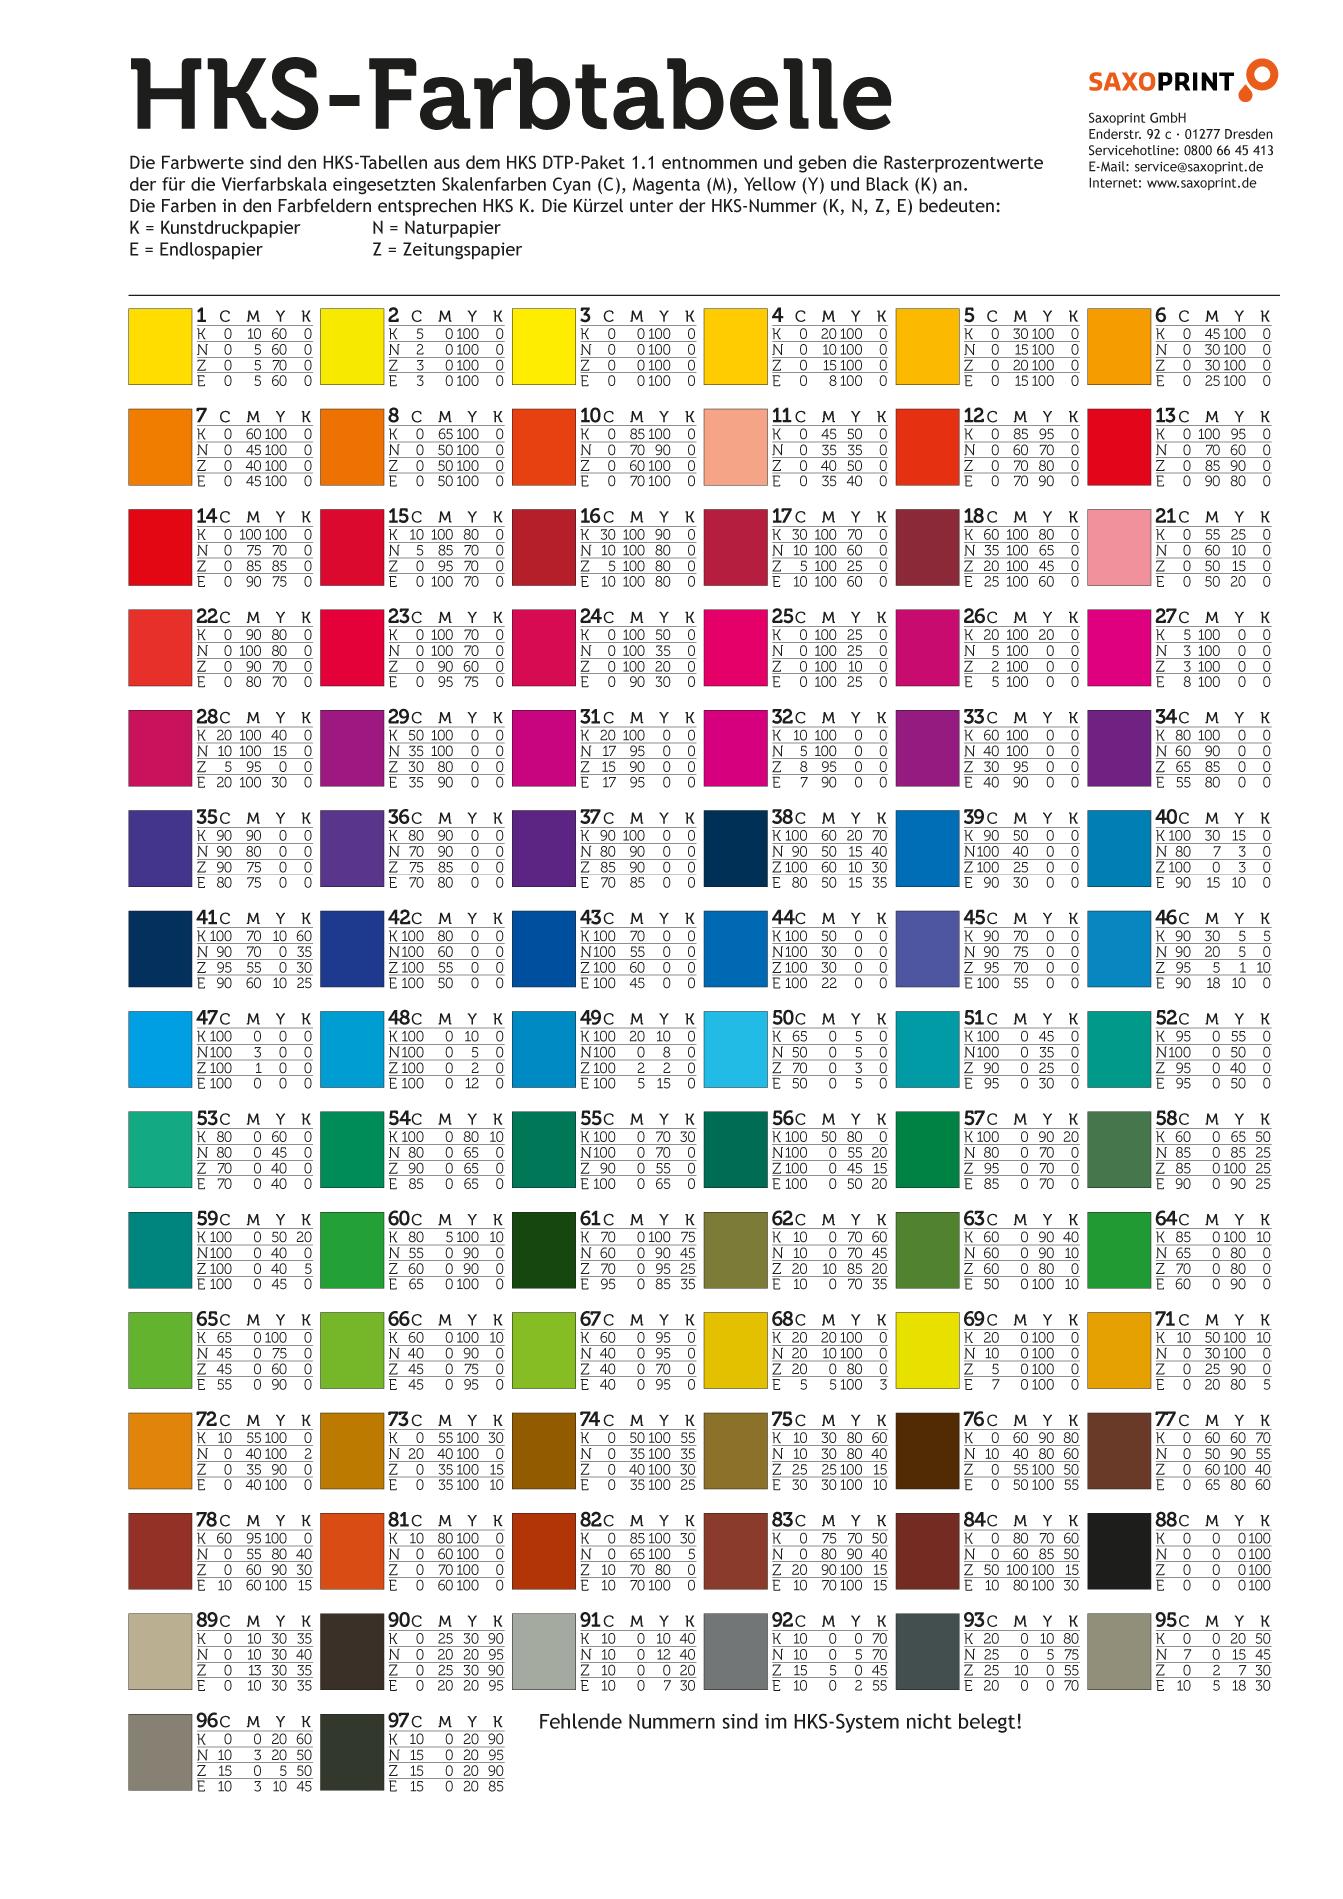 farben im hks farbf cher farbtabelle saxoprint blog c o l o r s pinterest farbf cher. Black Bedroom Furniture Sets. Home Design Ideas